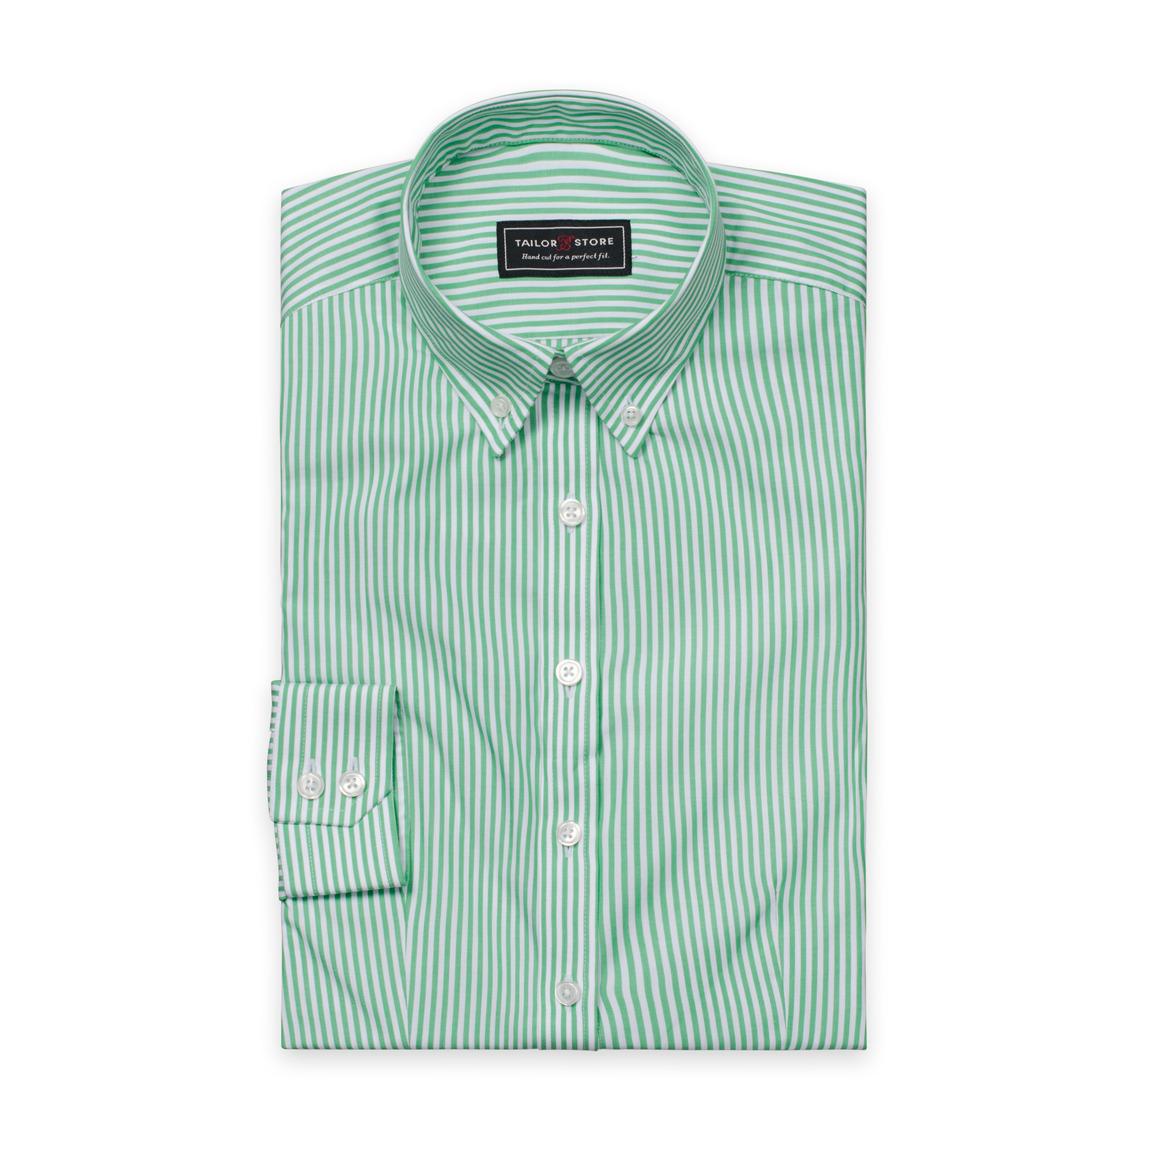 Vit/grönrandig poplinskjorta